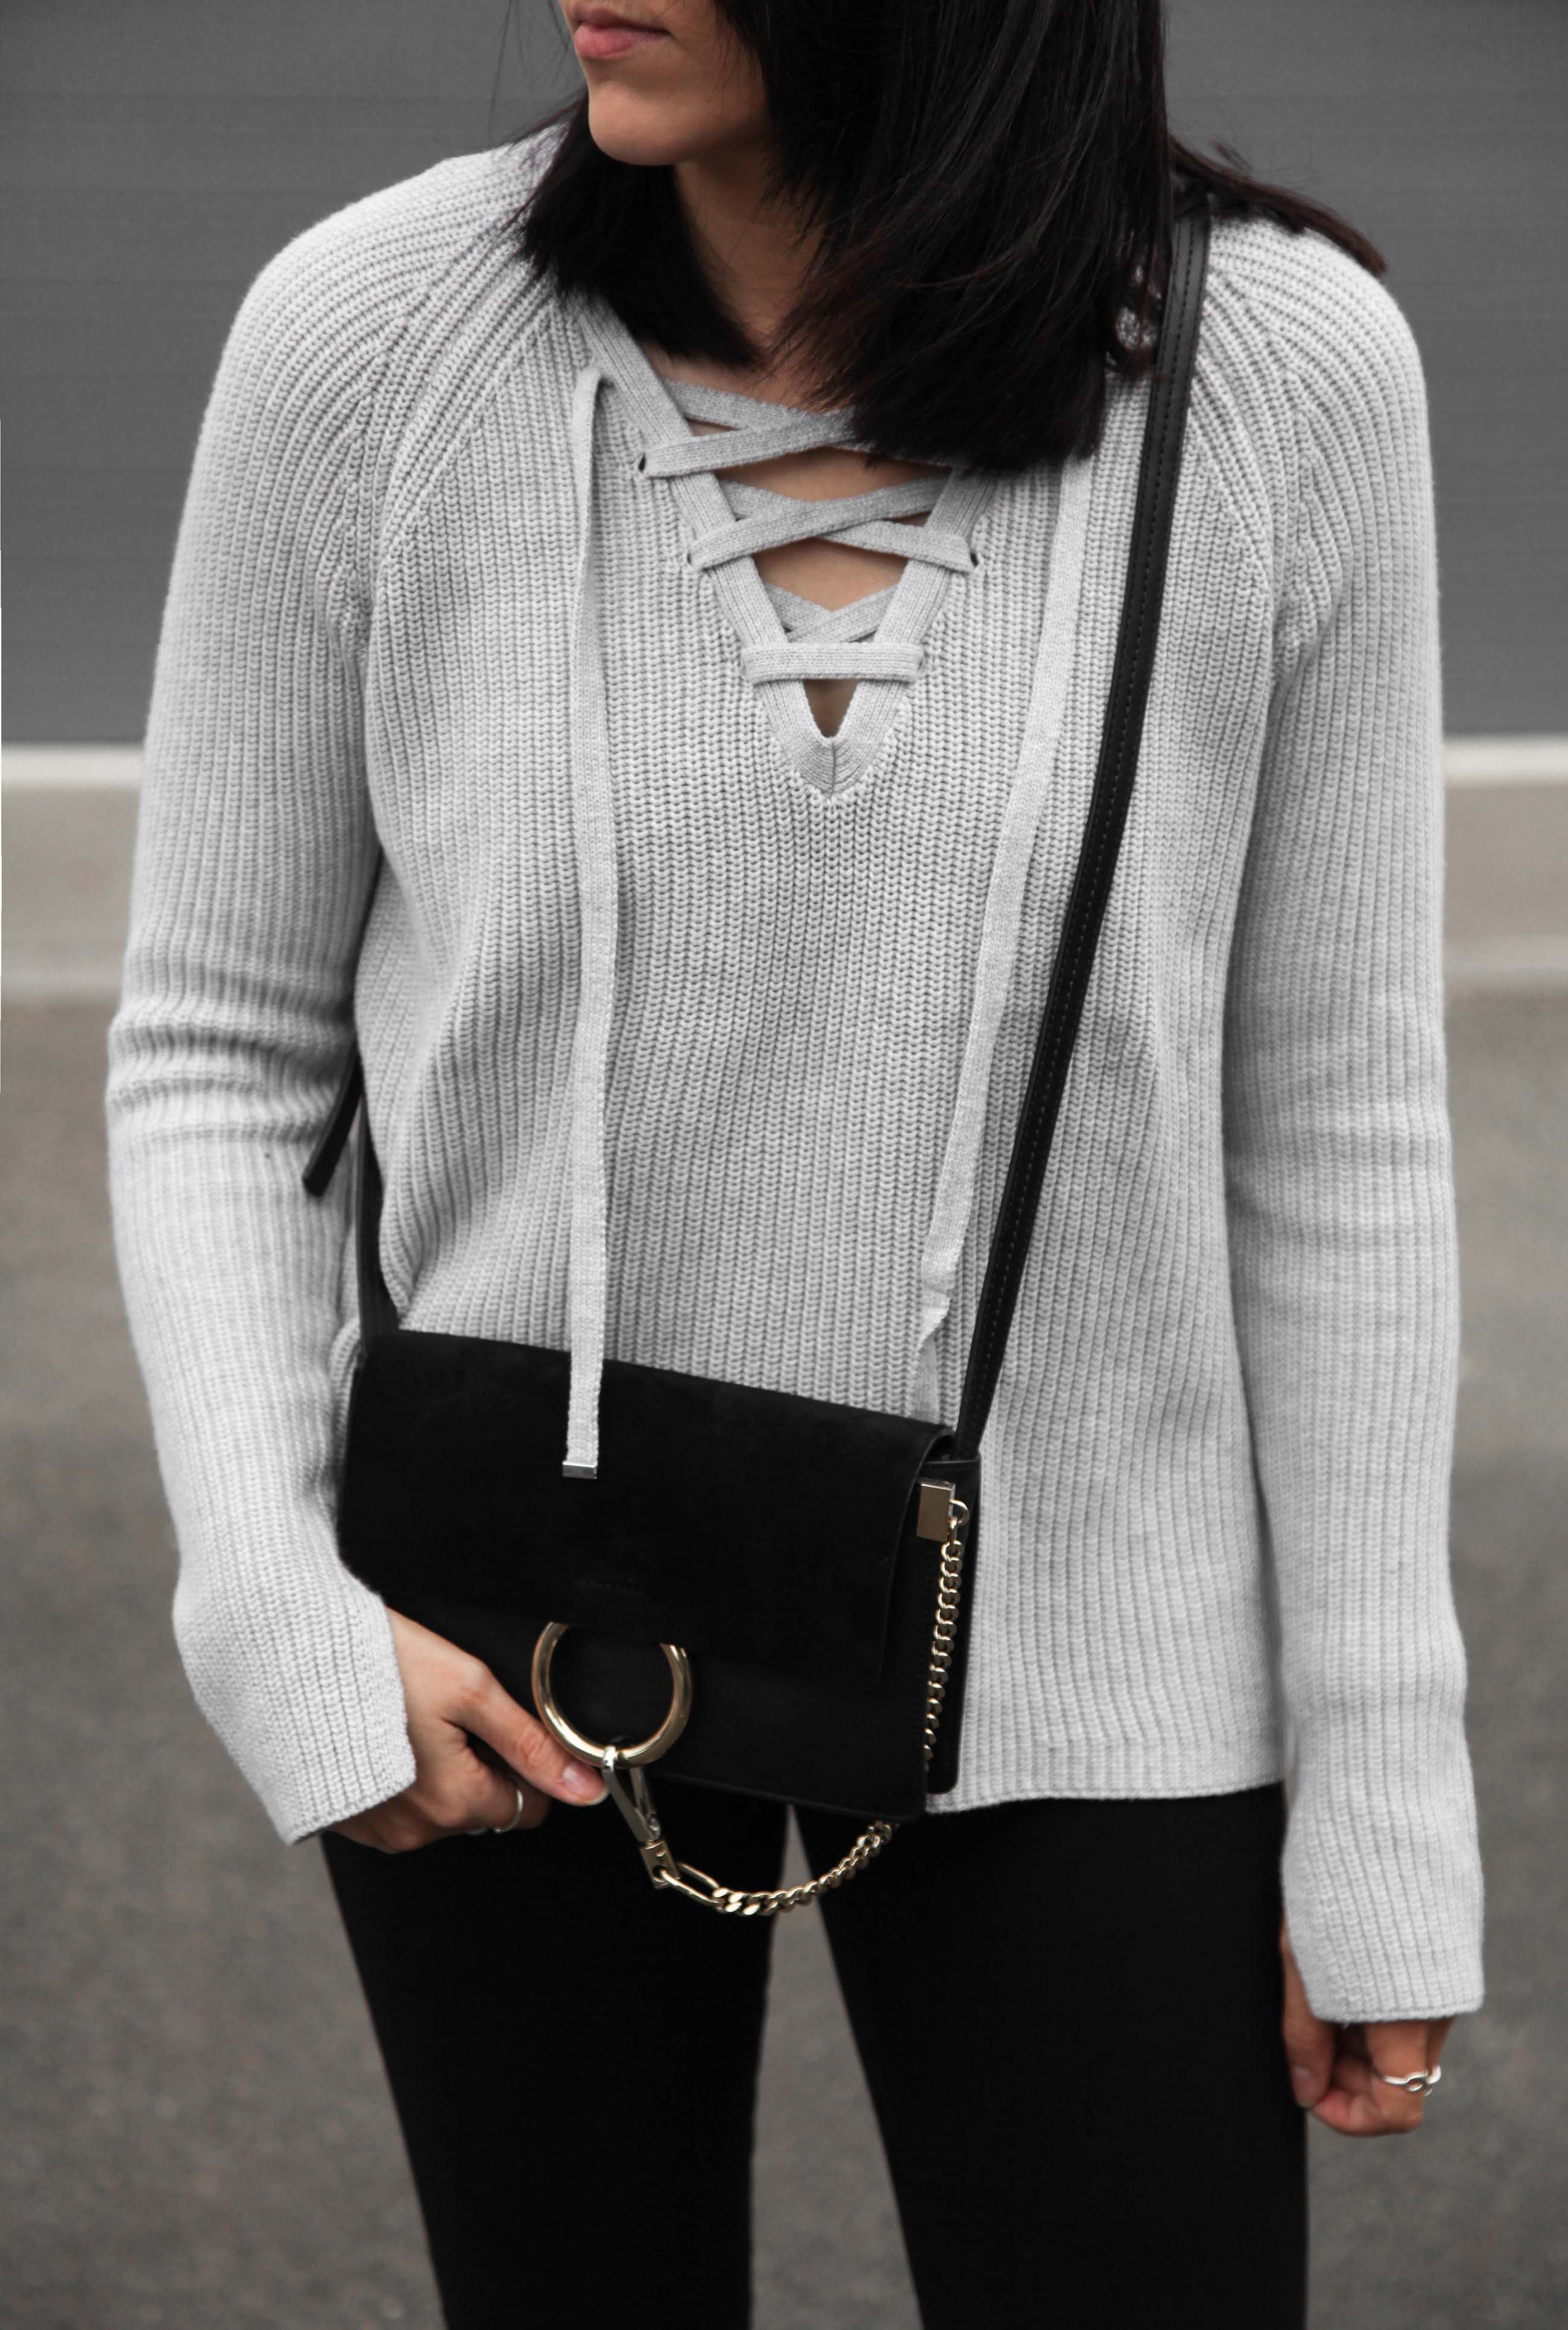 grey layers  - designbyaikonik 6